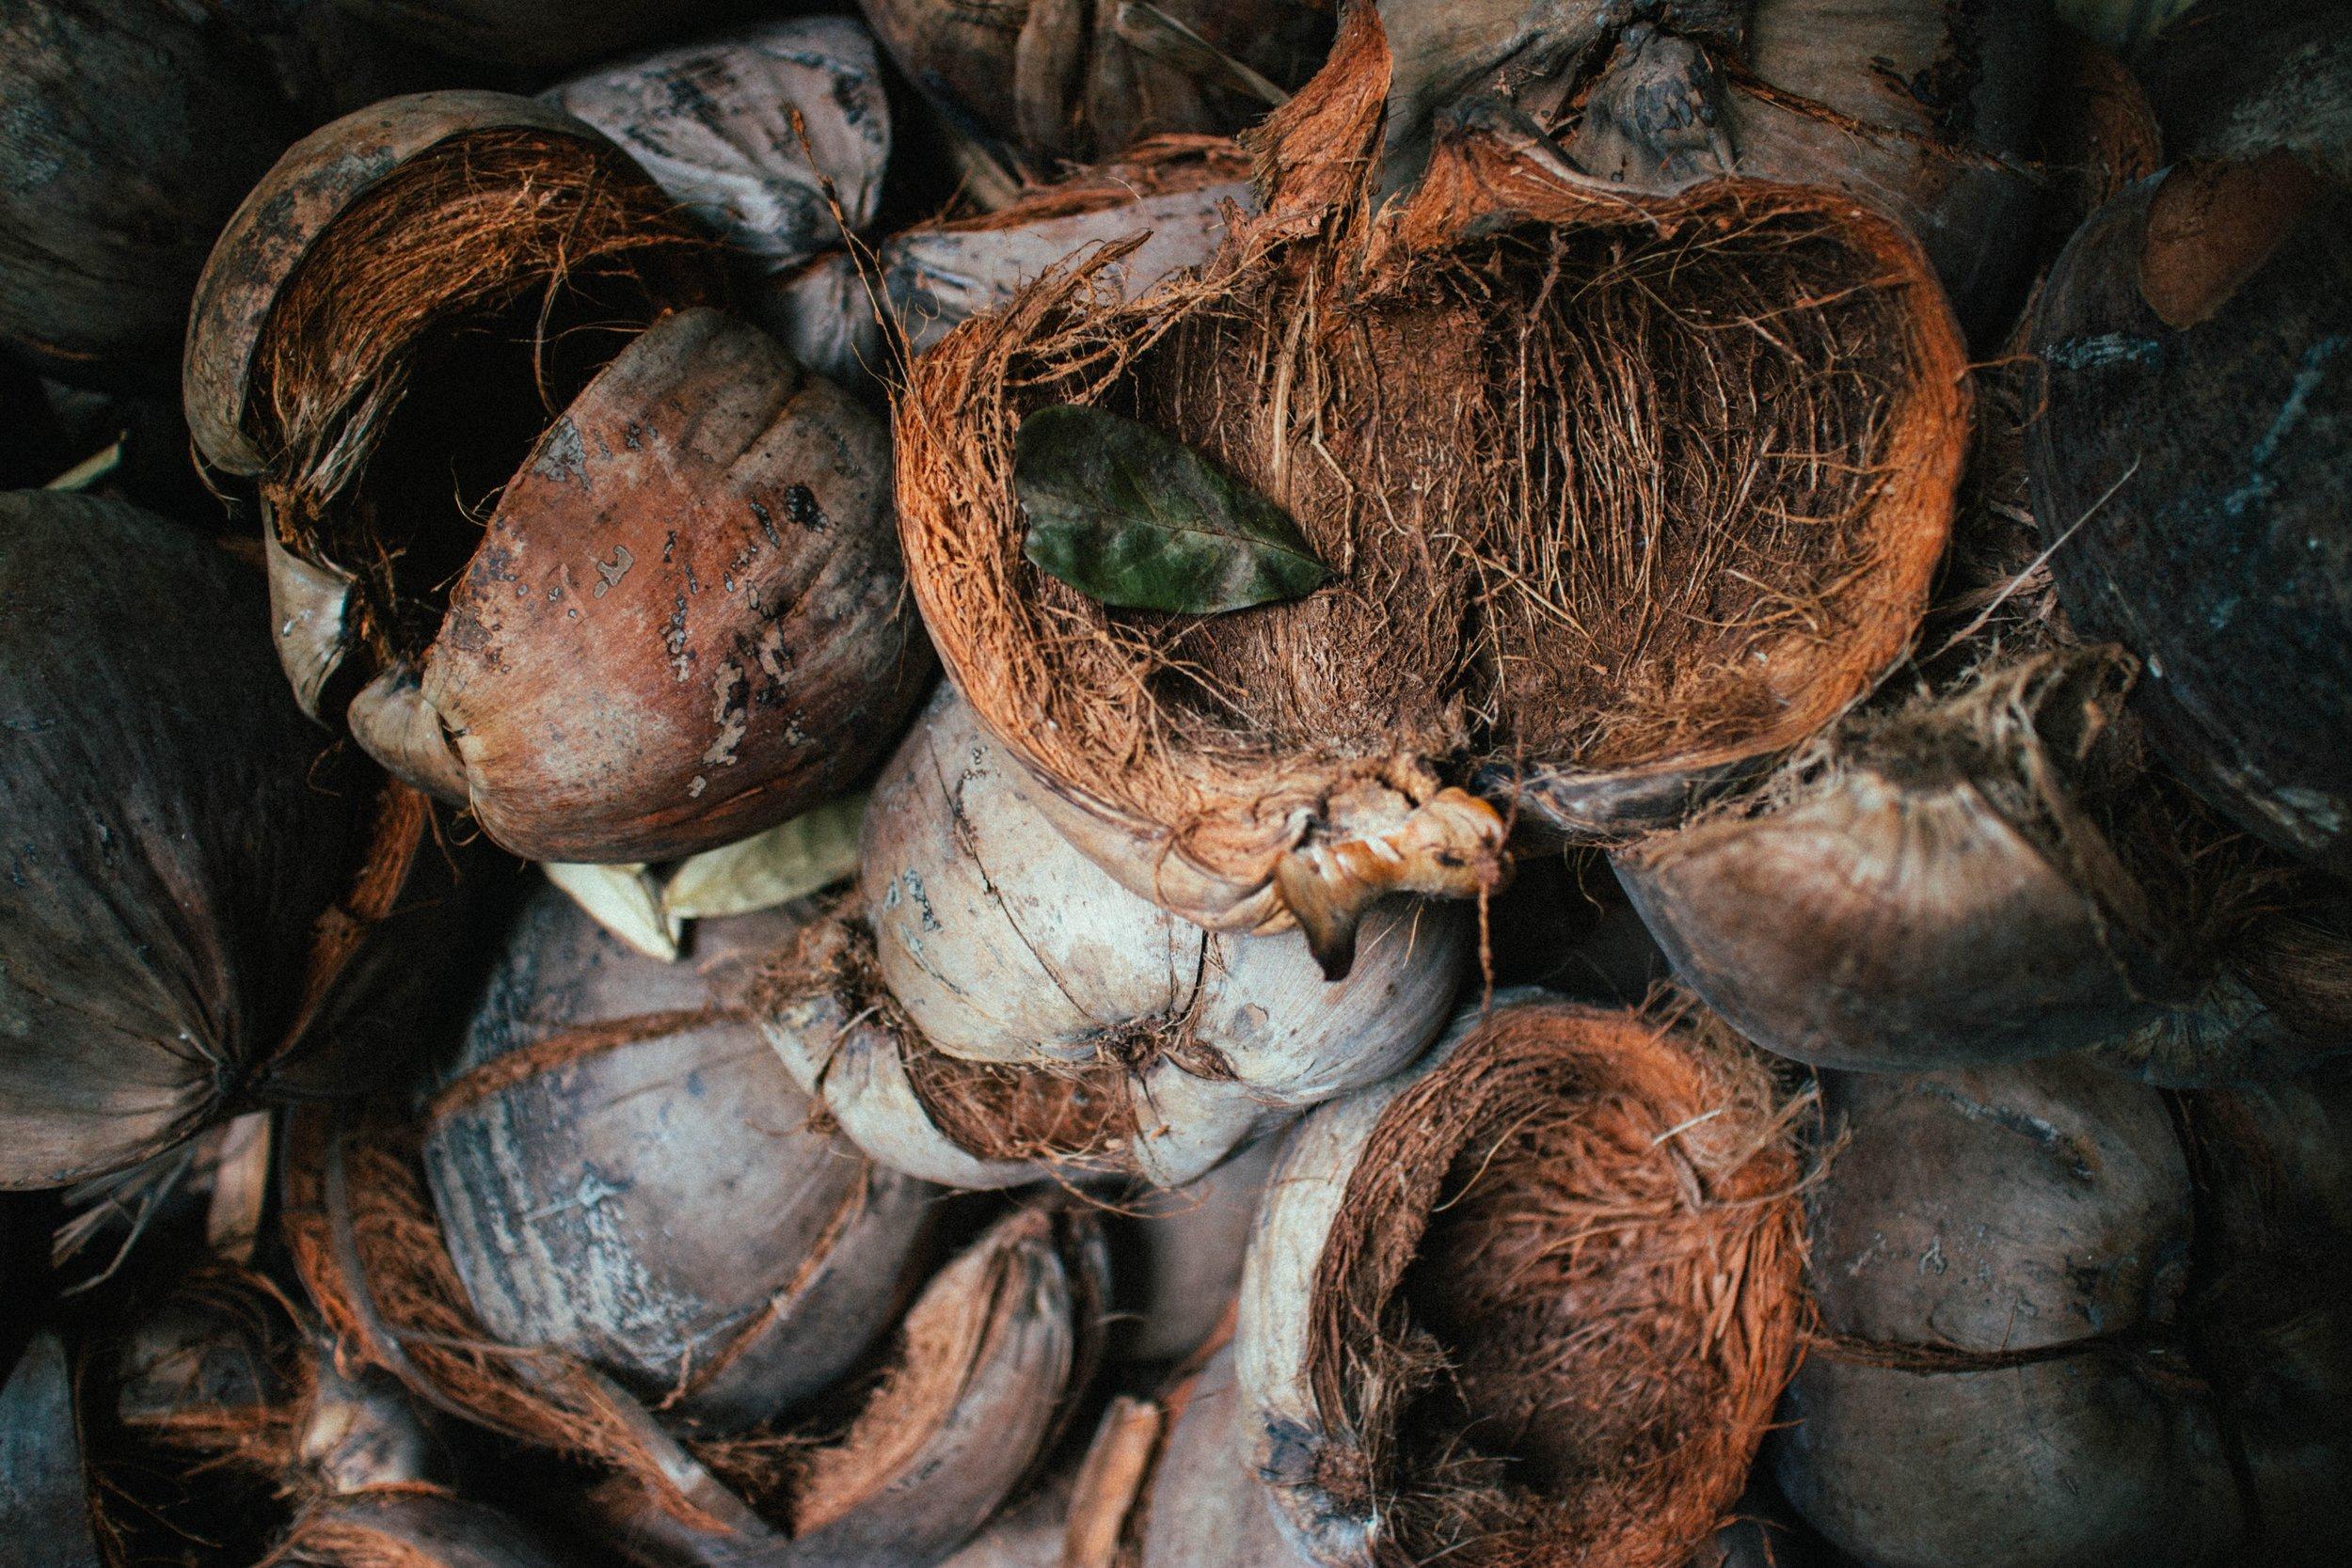 bloom_candyfloss_coconut_charcoal_organic_ingredients.jpg